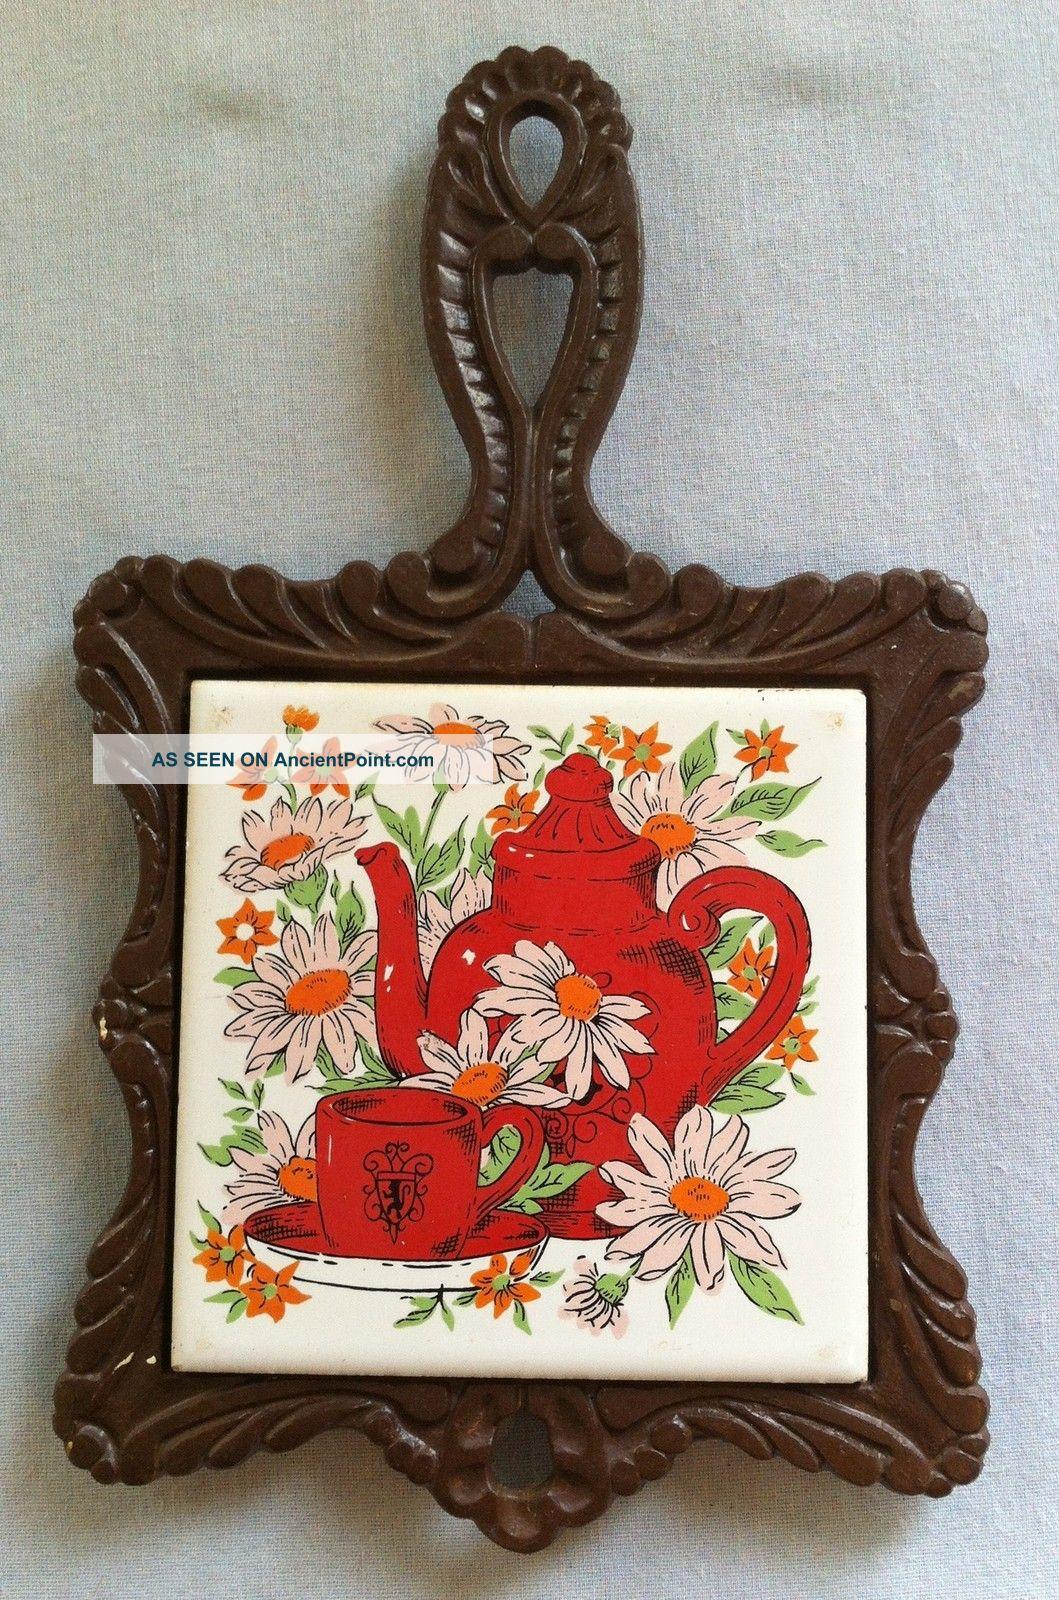 Vintage Cast Iron Tile Trivet (7 Seven Star) Teapot & Sunflower Design Trivets photo